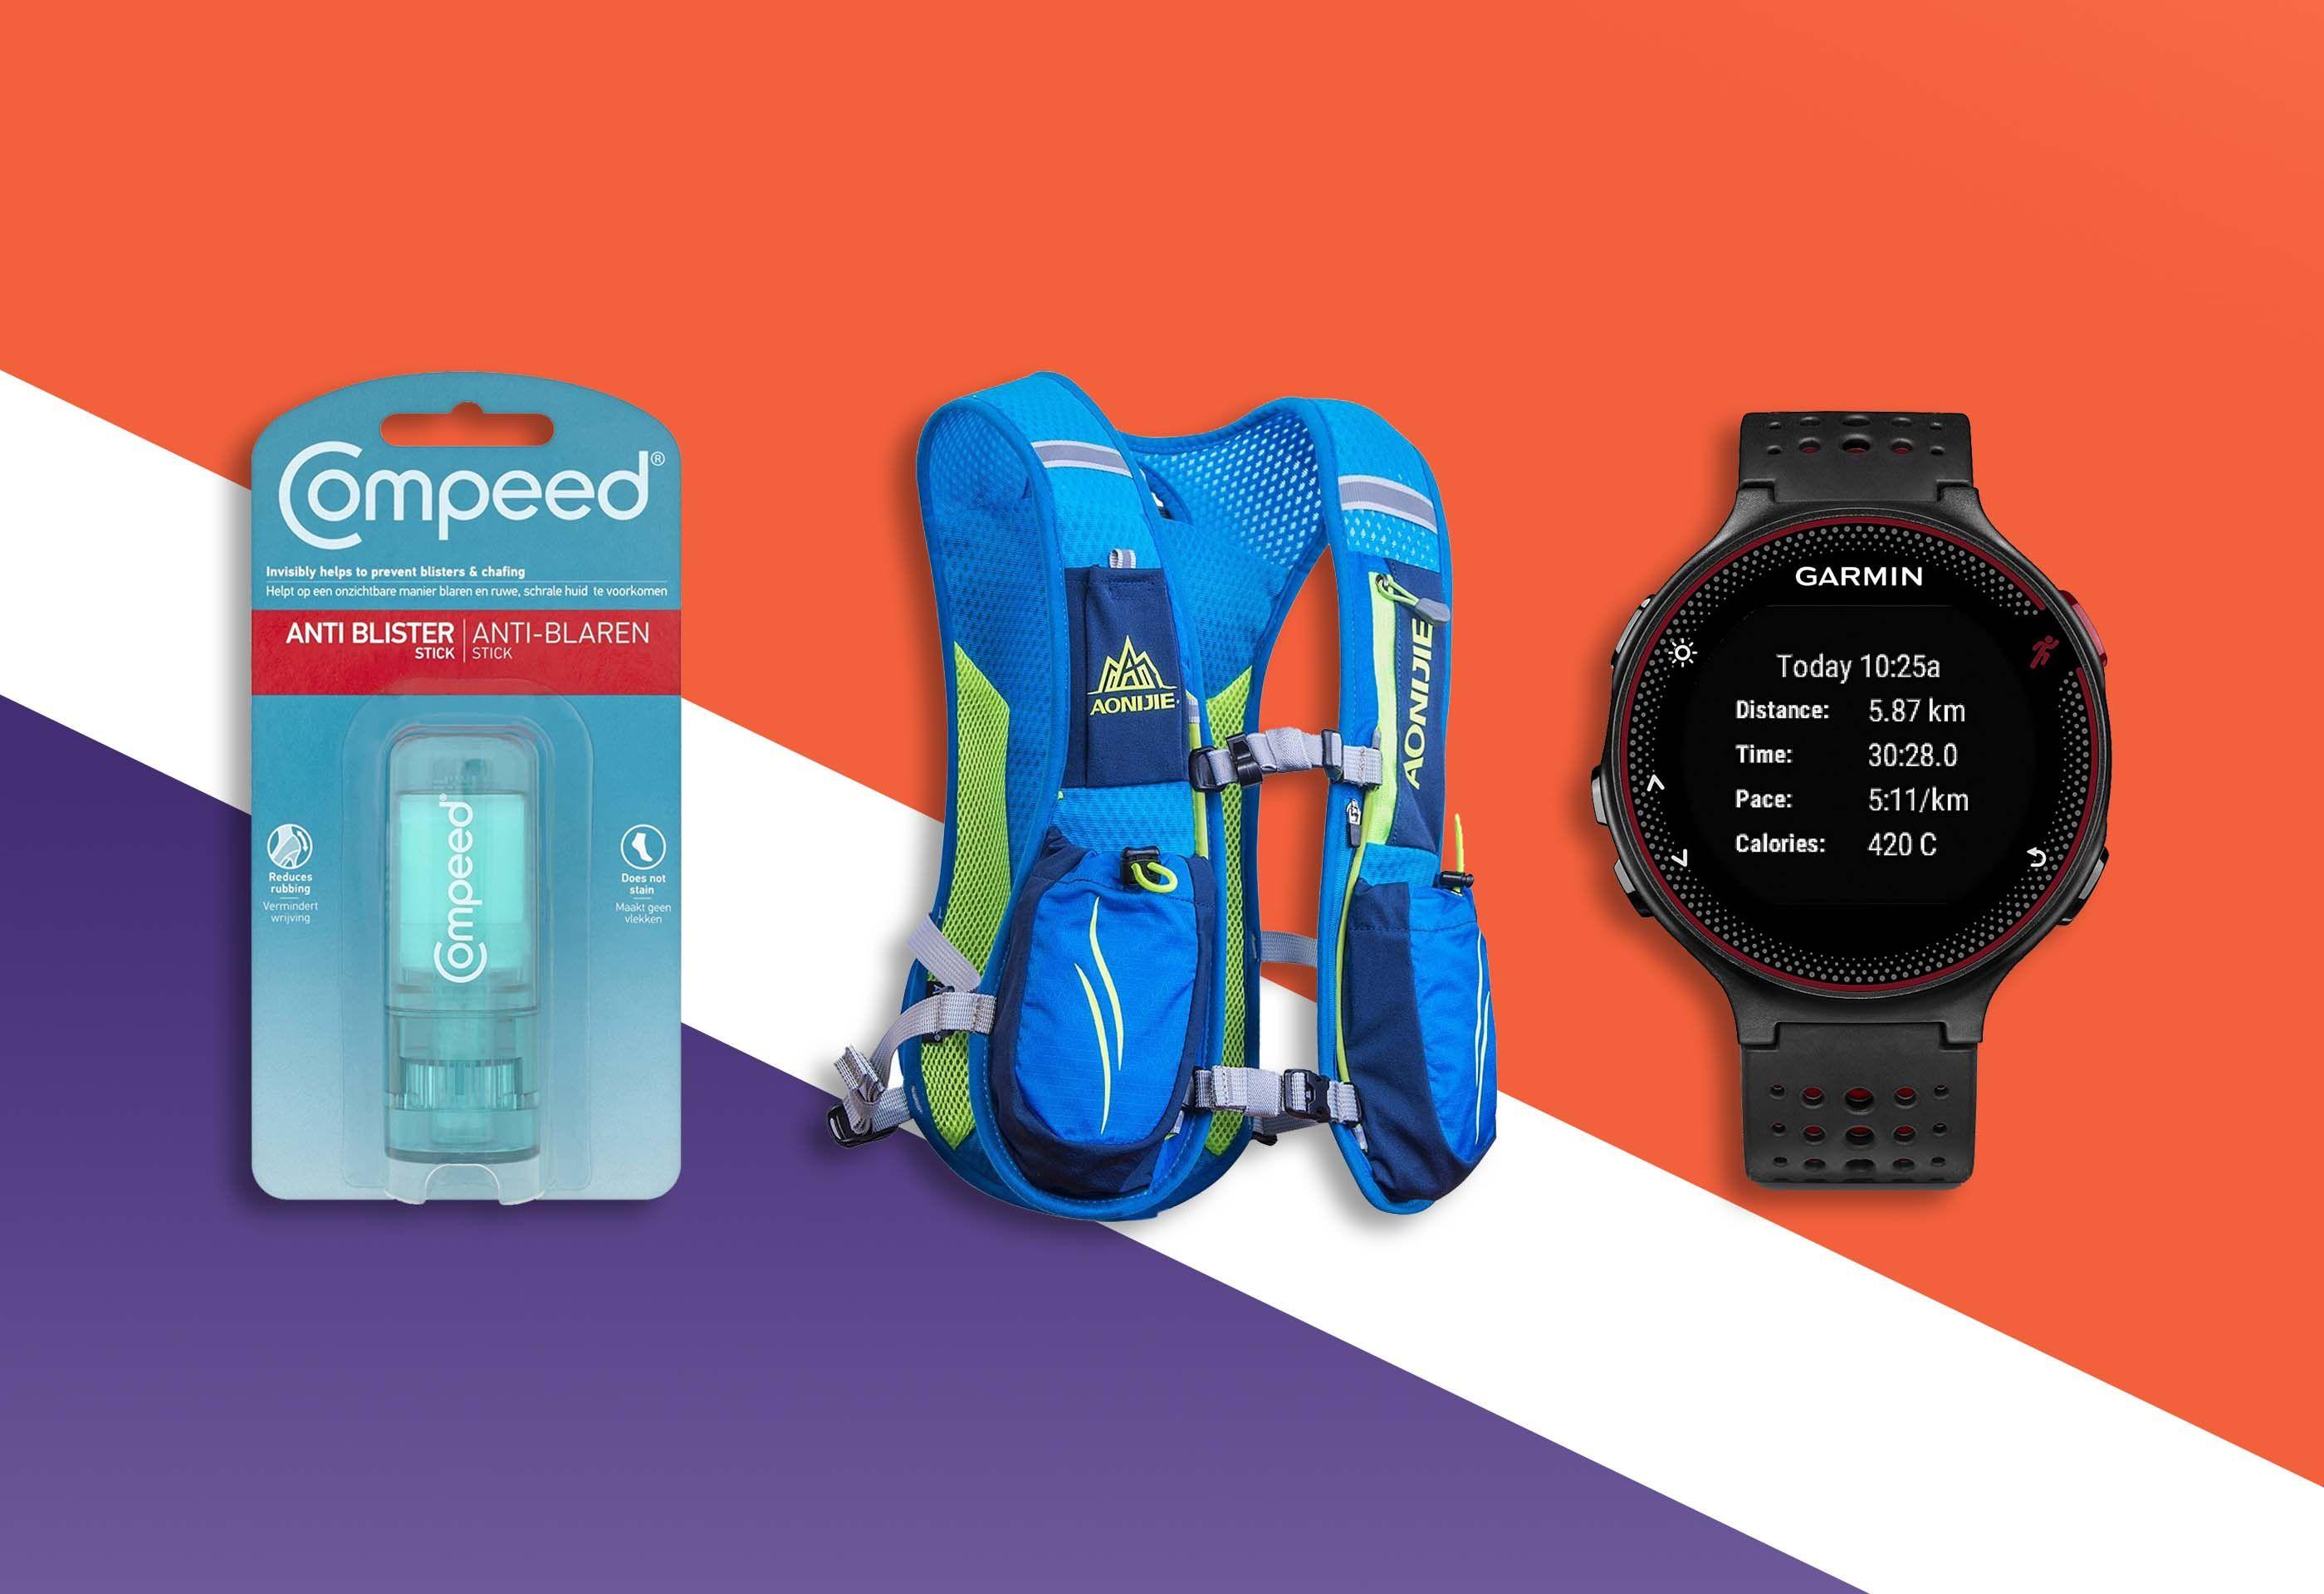 Sportswear, sports equipment & supplements from Amazon